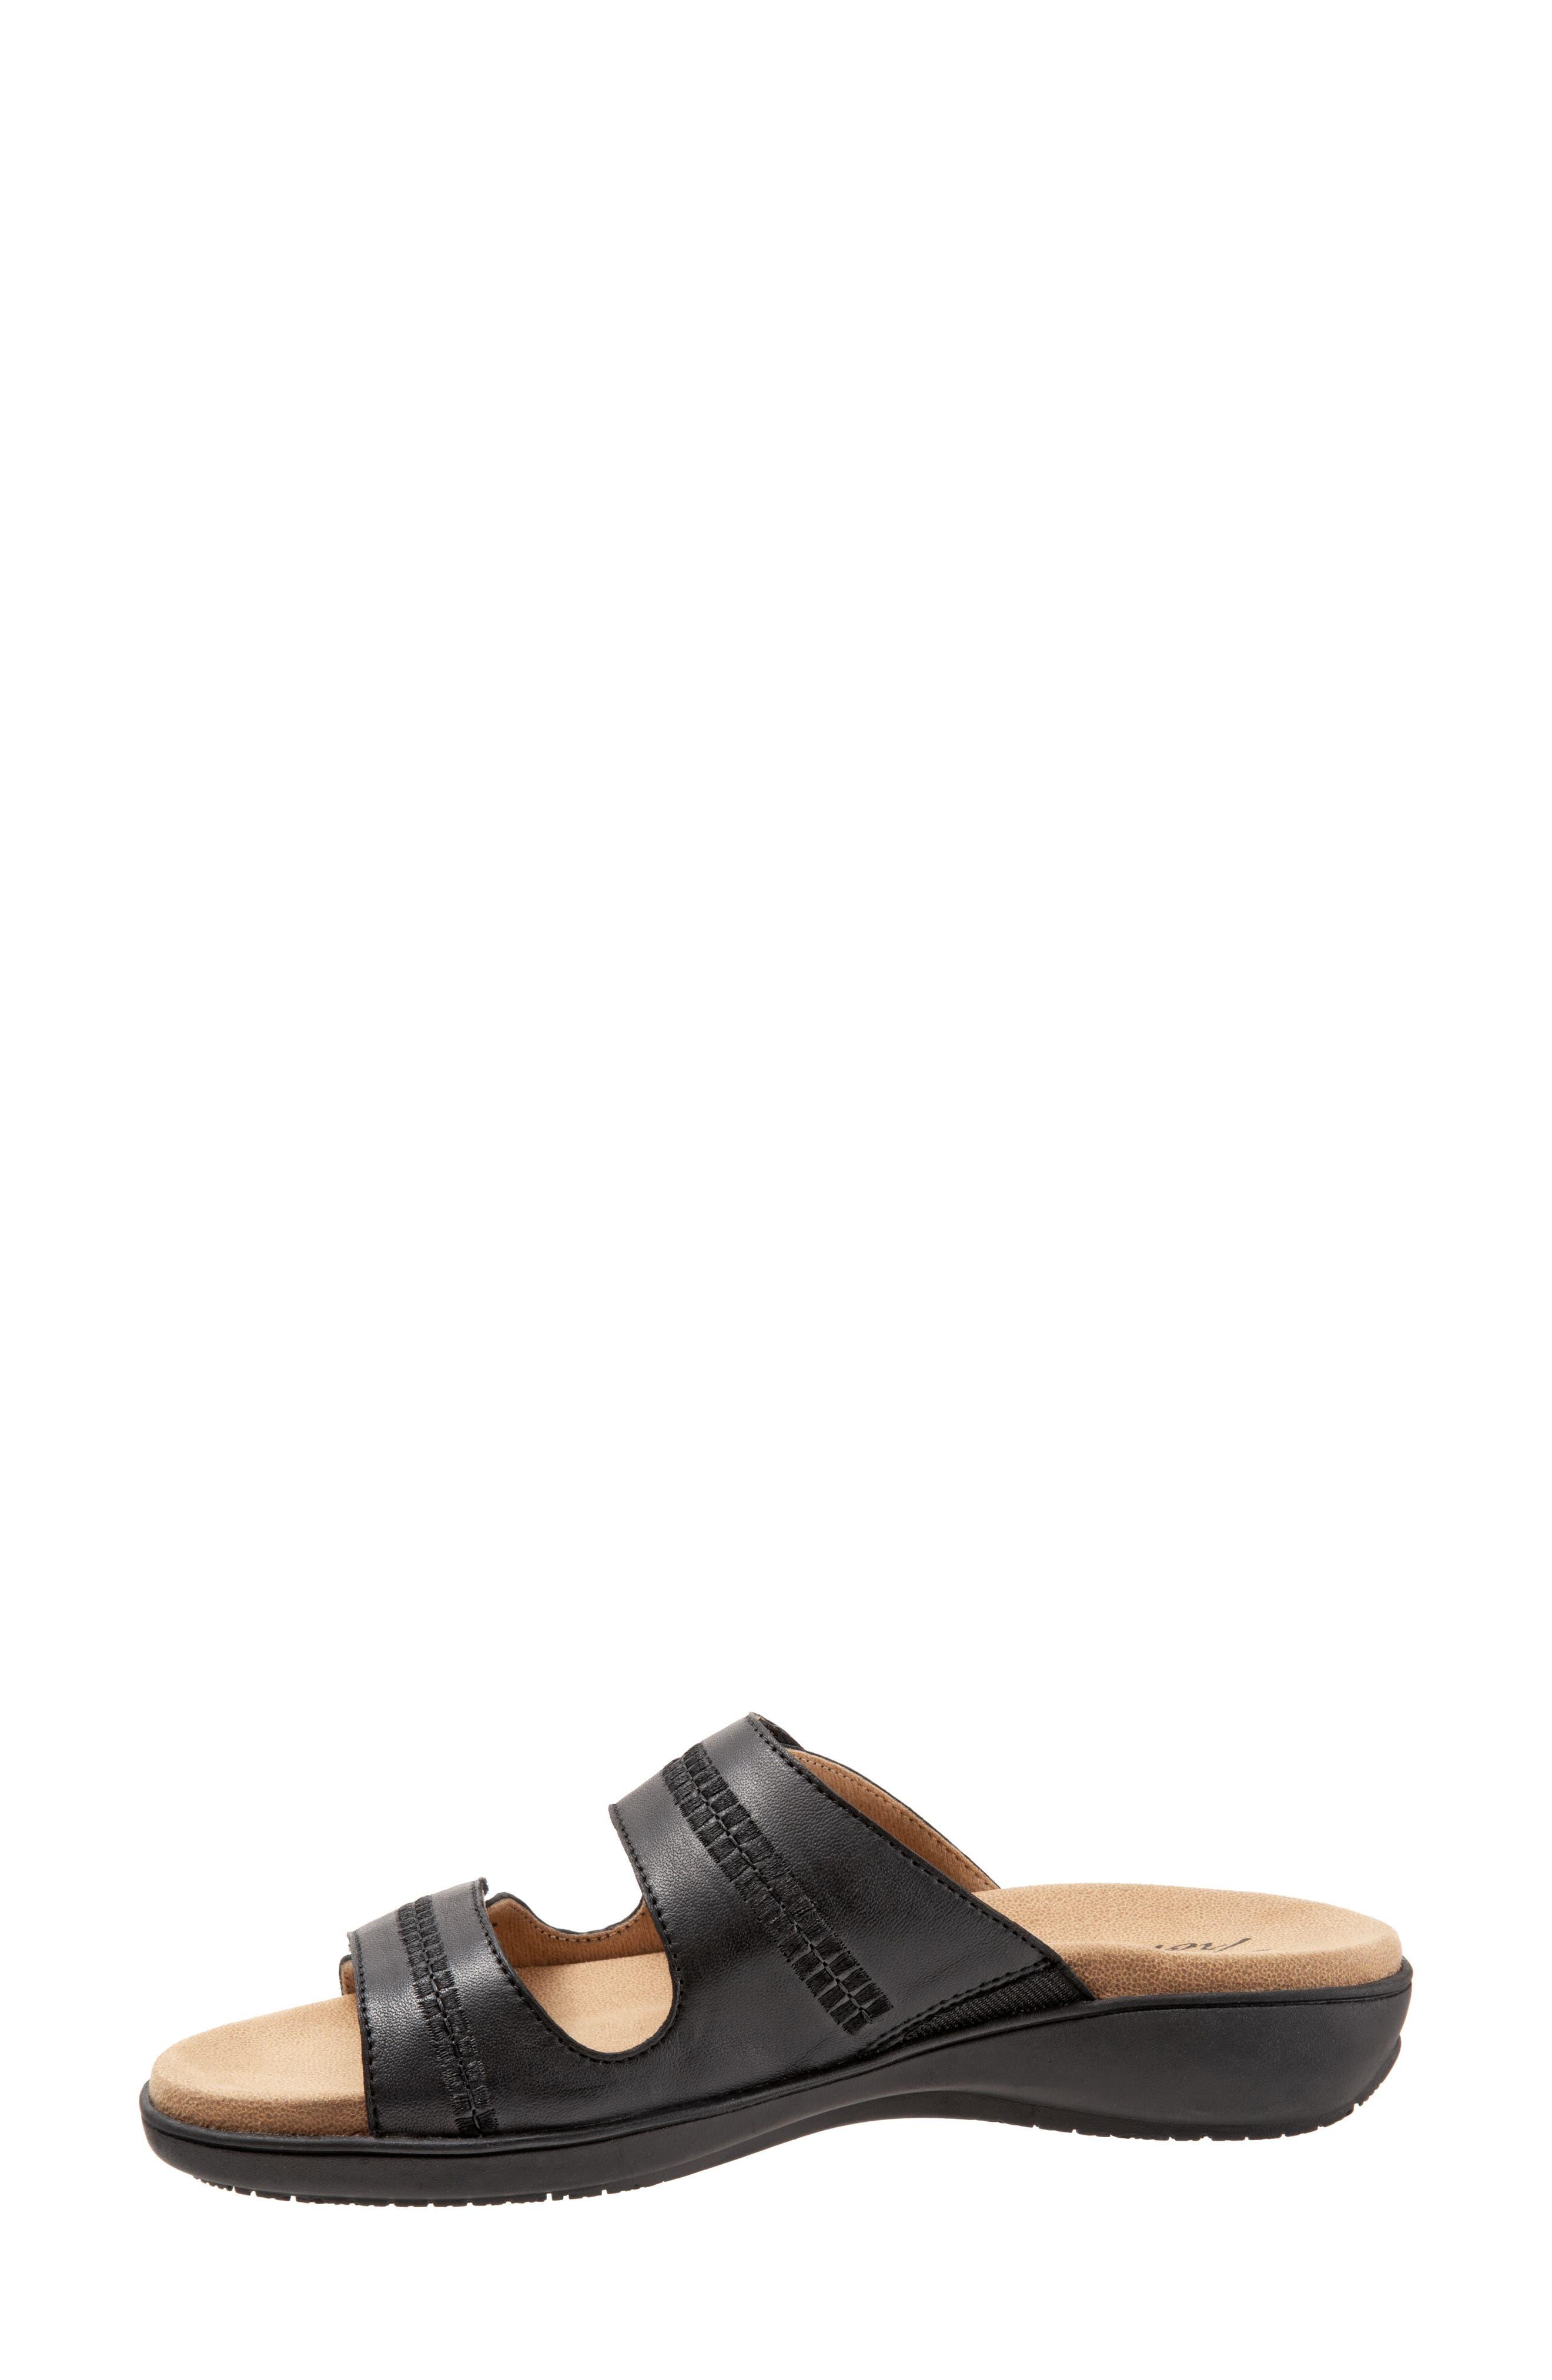 Vale Double Strap Slide Sandal,                             Alternate thumbnail 8, color,                             BLACK LEATHER